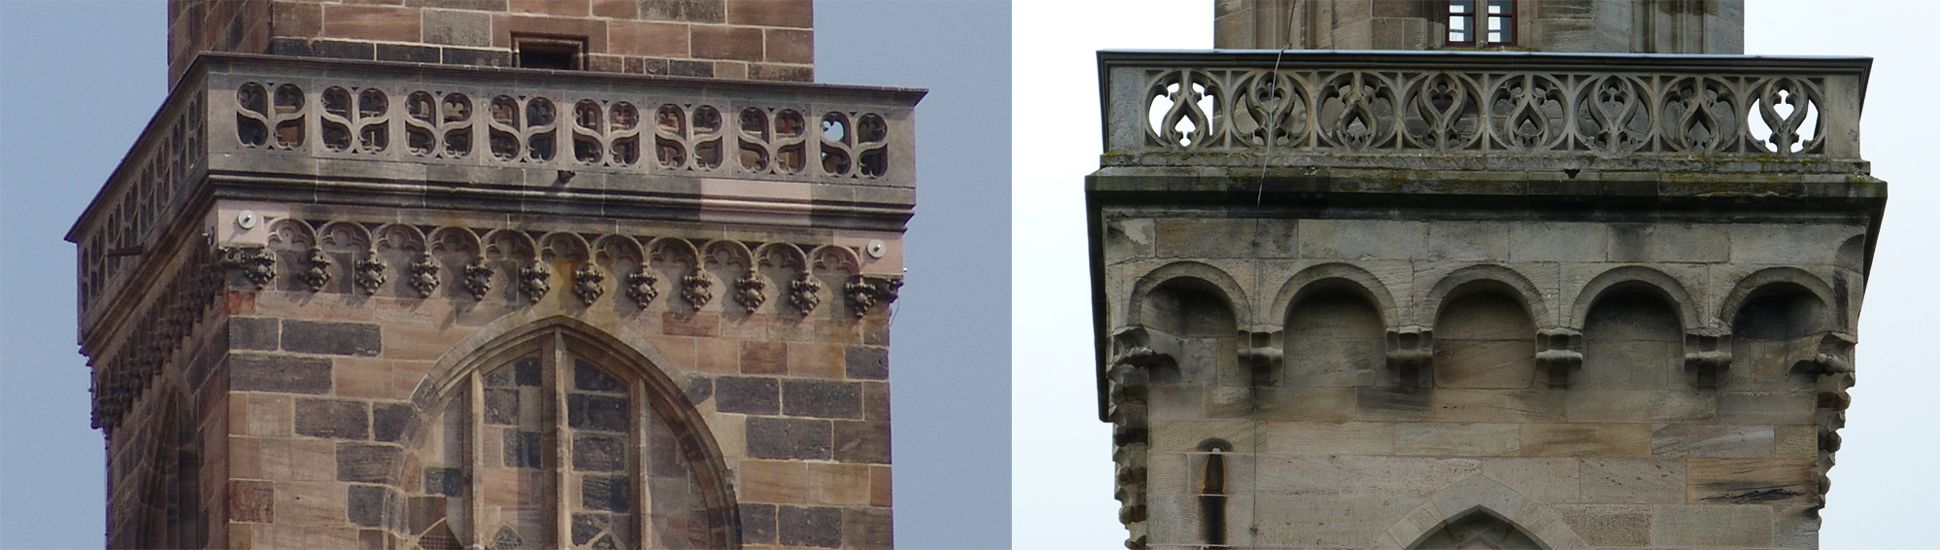 Stadtkirche St. Peter (Sonneberg) Vergleichsbild Turmmaßwerkgalerien von St. Sebald in Nürnberg und St. Peter in Sonneberg